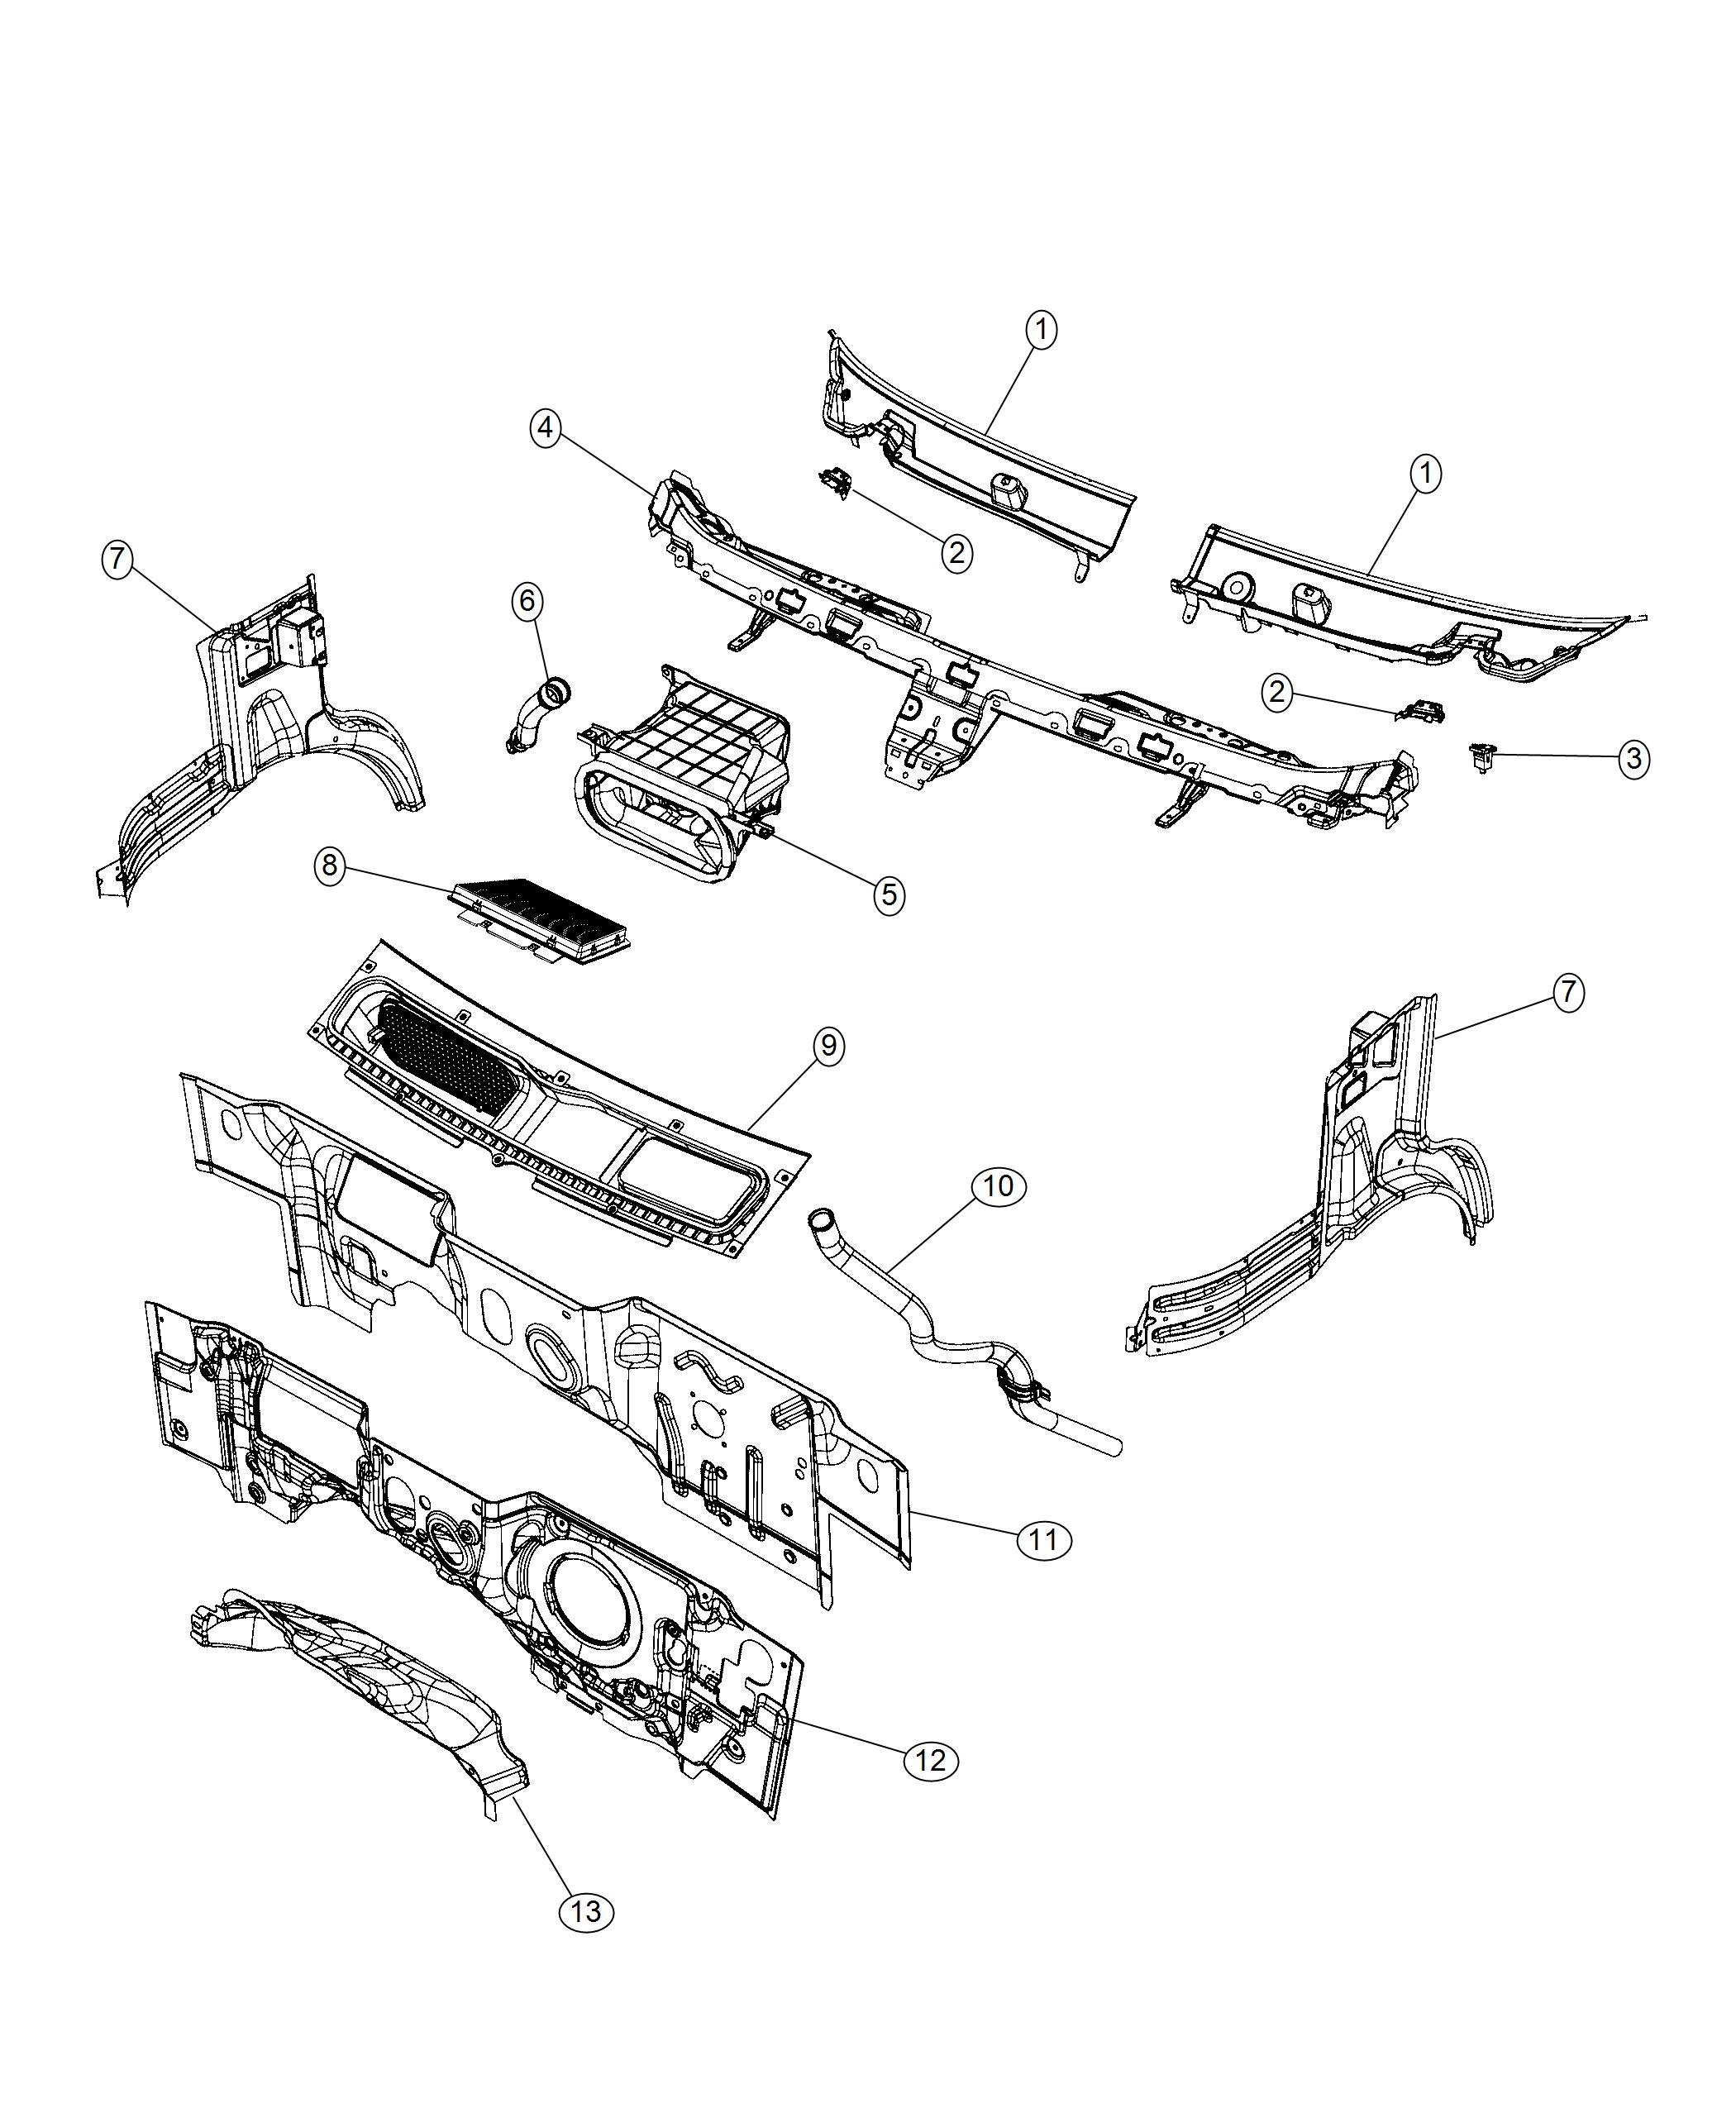 Dodge Ram 2500 Transmission Crossmember   Wiring Diagram Database on dodge truck wiring diagram, 99 dodge radio wiring diagram, 2007 dodge ram 2500 wiring diagram, 1995 dodge dakota wiring diagram, 1995 chevy silverado brake wiring diagram, 95 dodge 2500 wiring diagram, 1997 dodge ram transmission diagram,